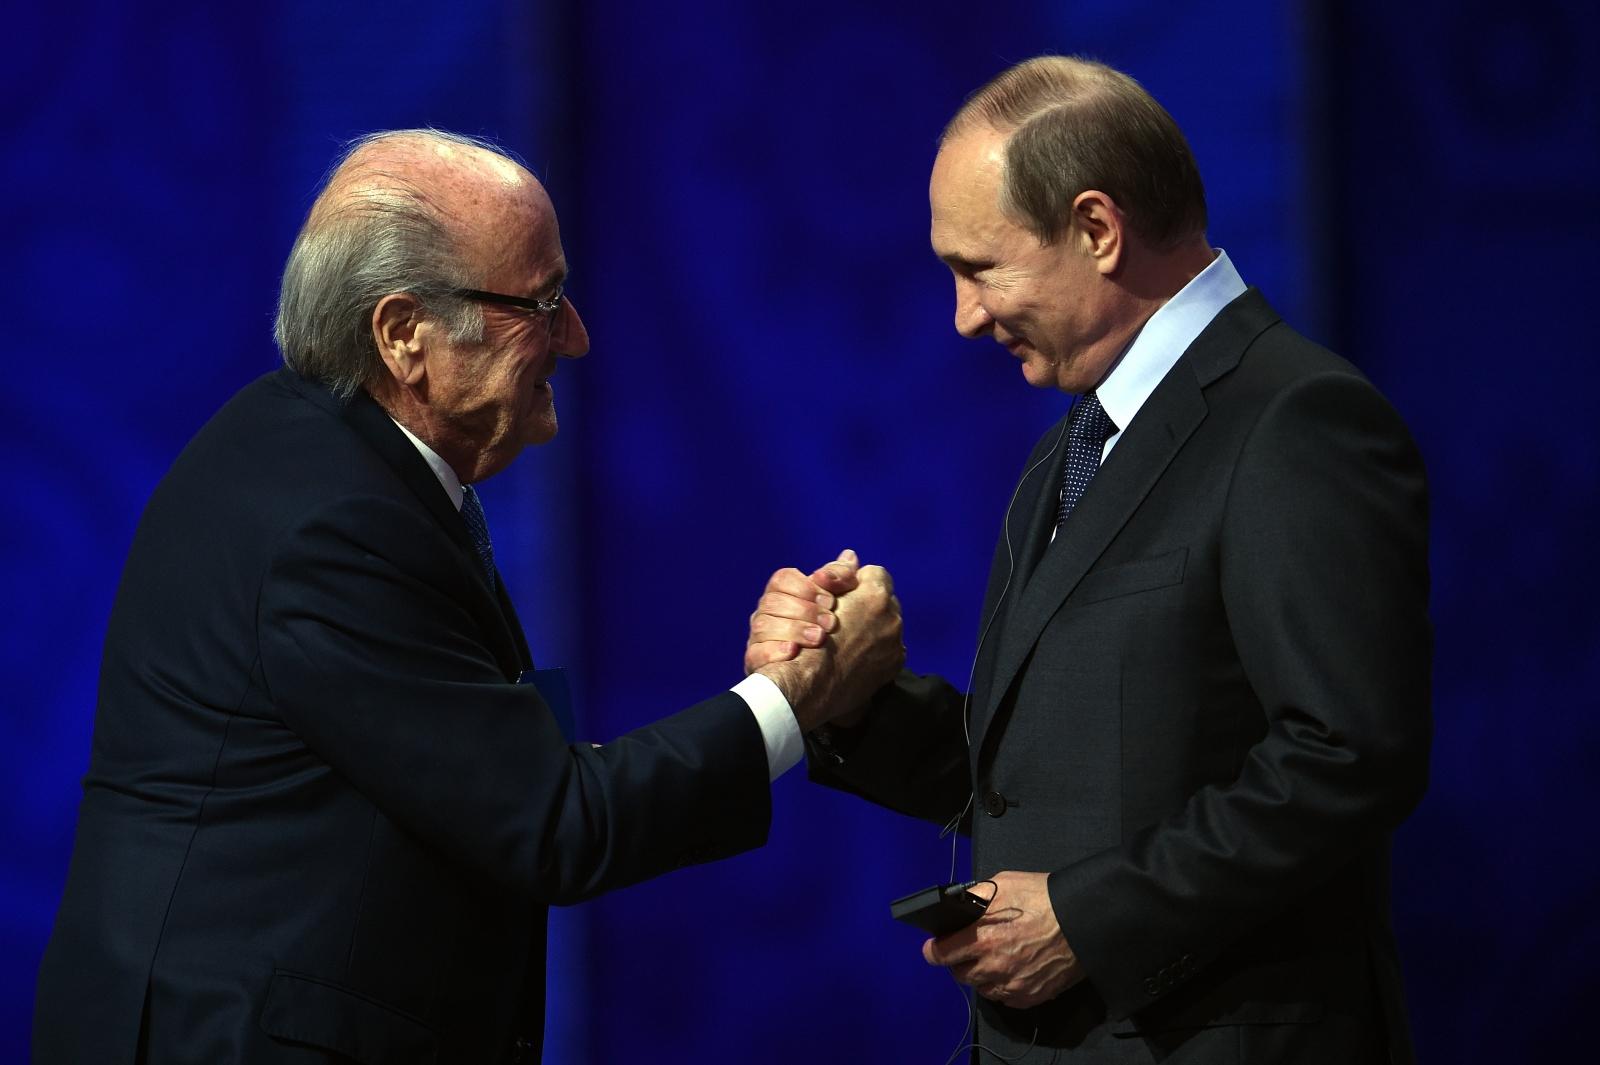 Sepp Blatter and Vladimir Putin at the